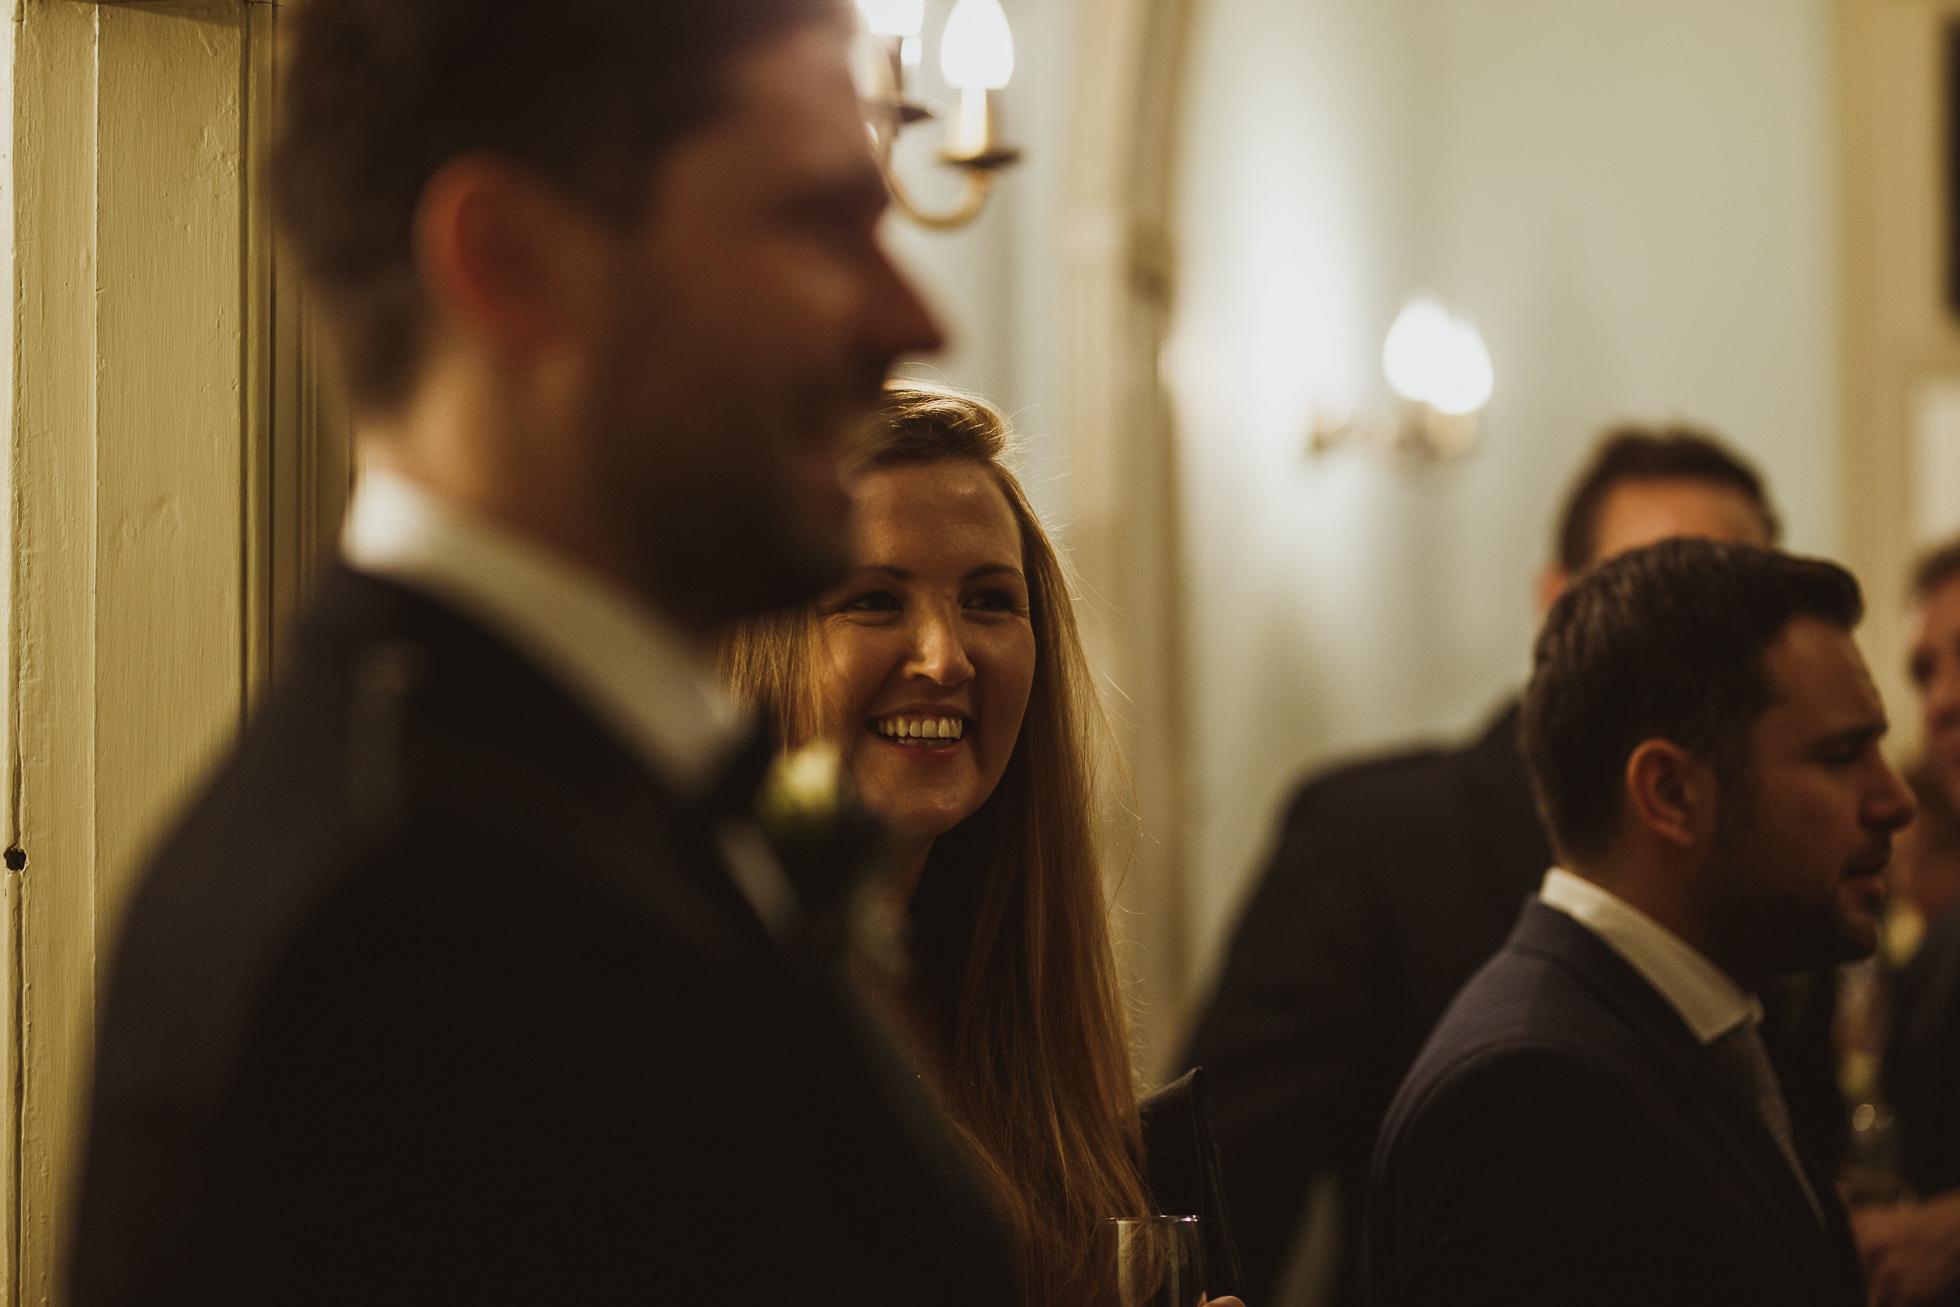 hornington_manor_wedding_photographer-90.jpg